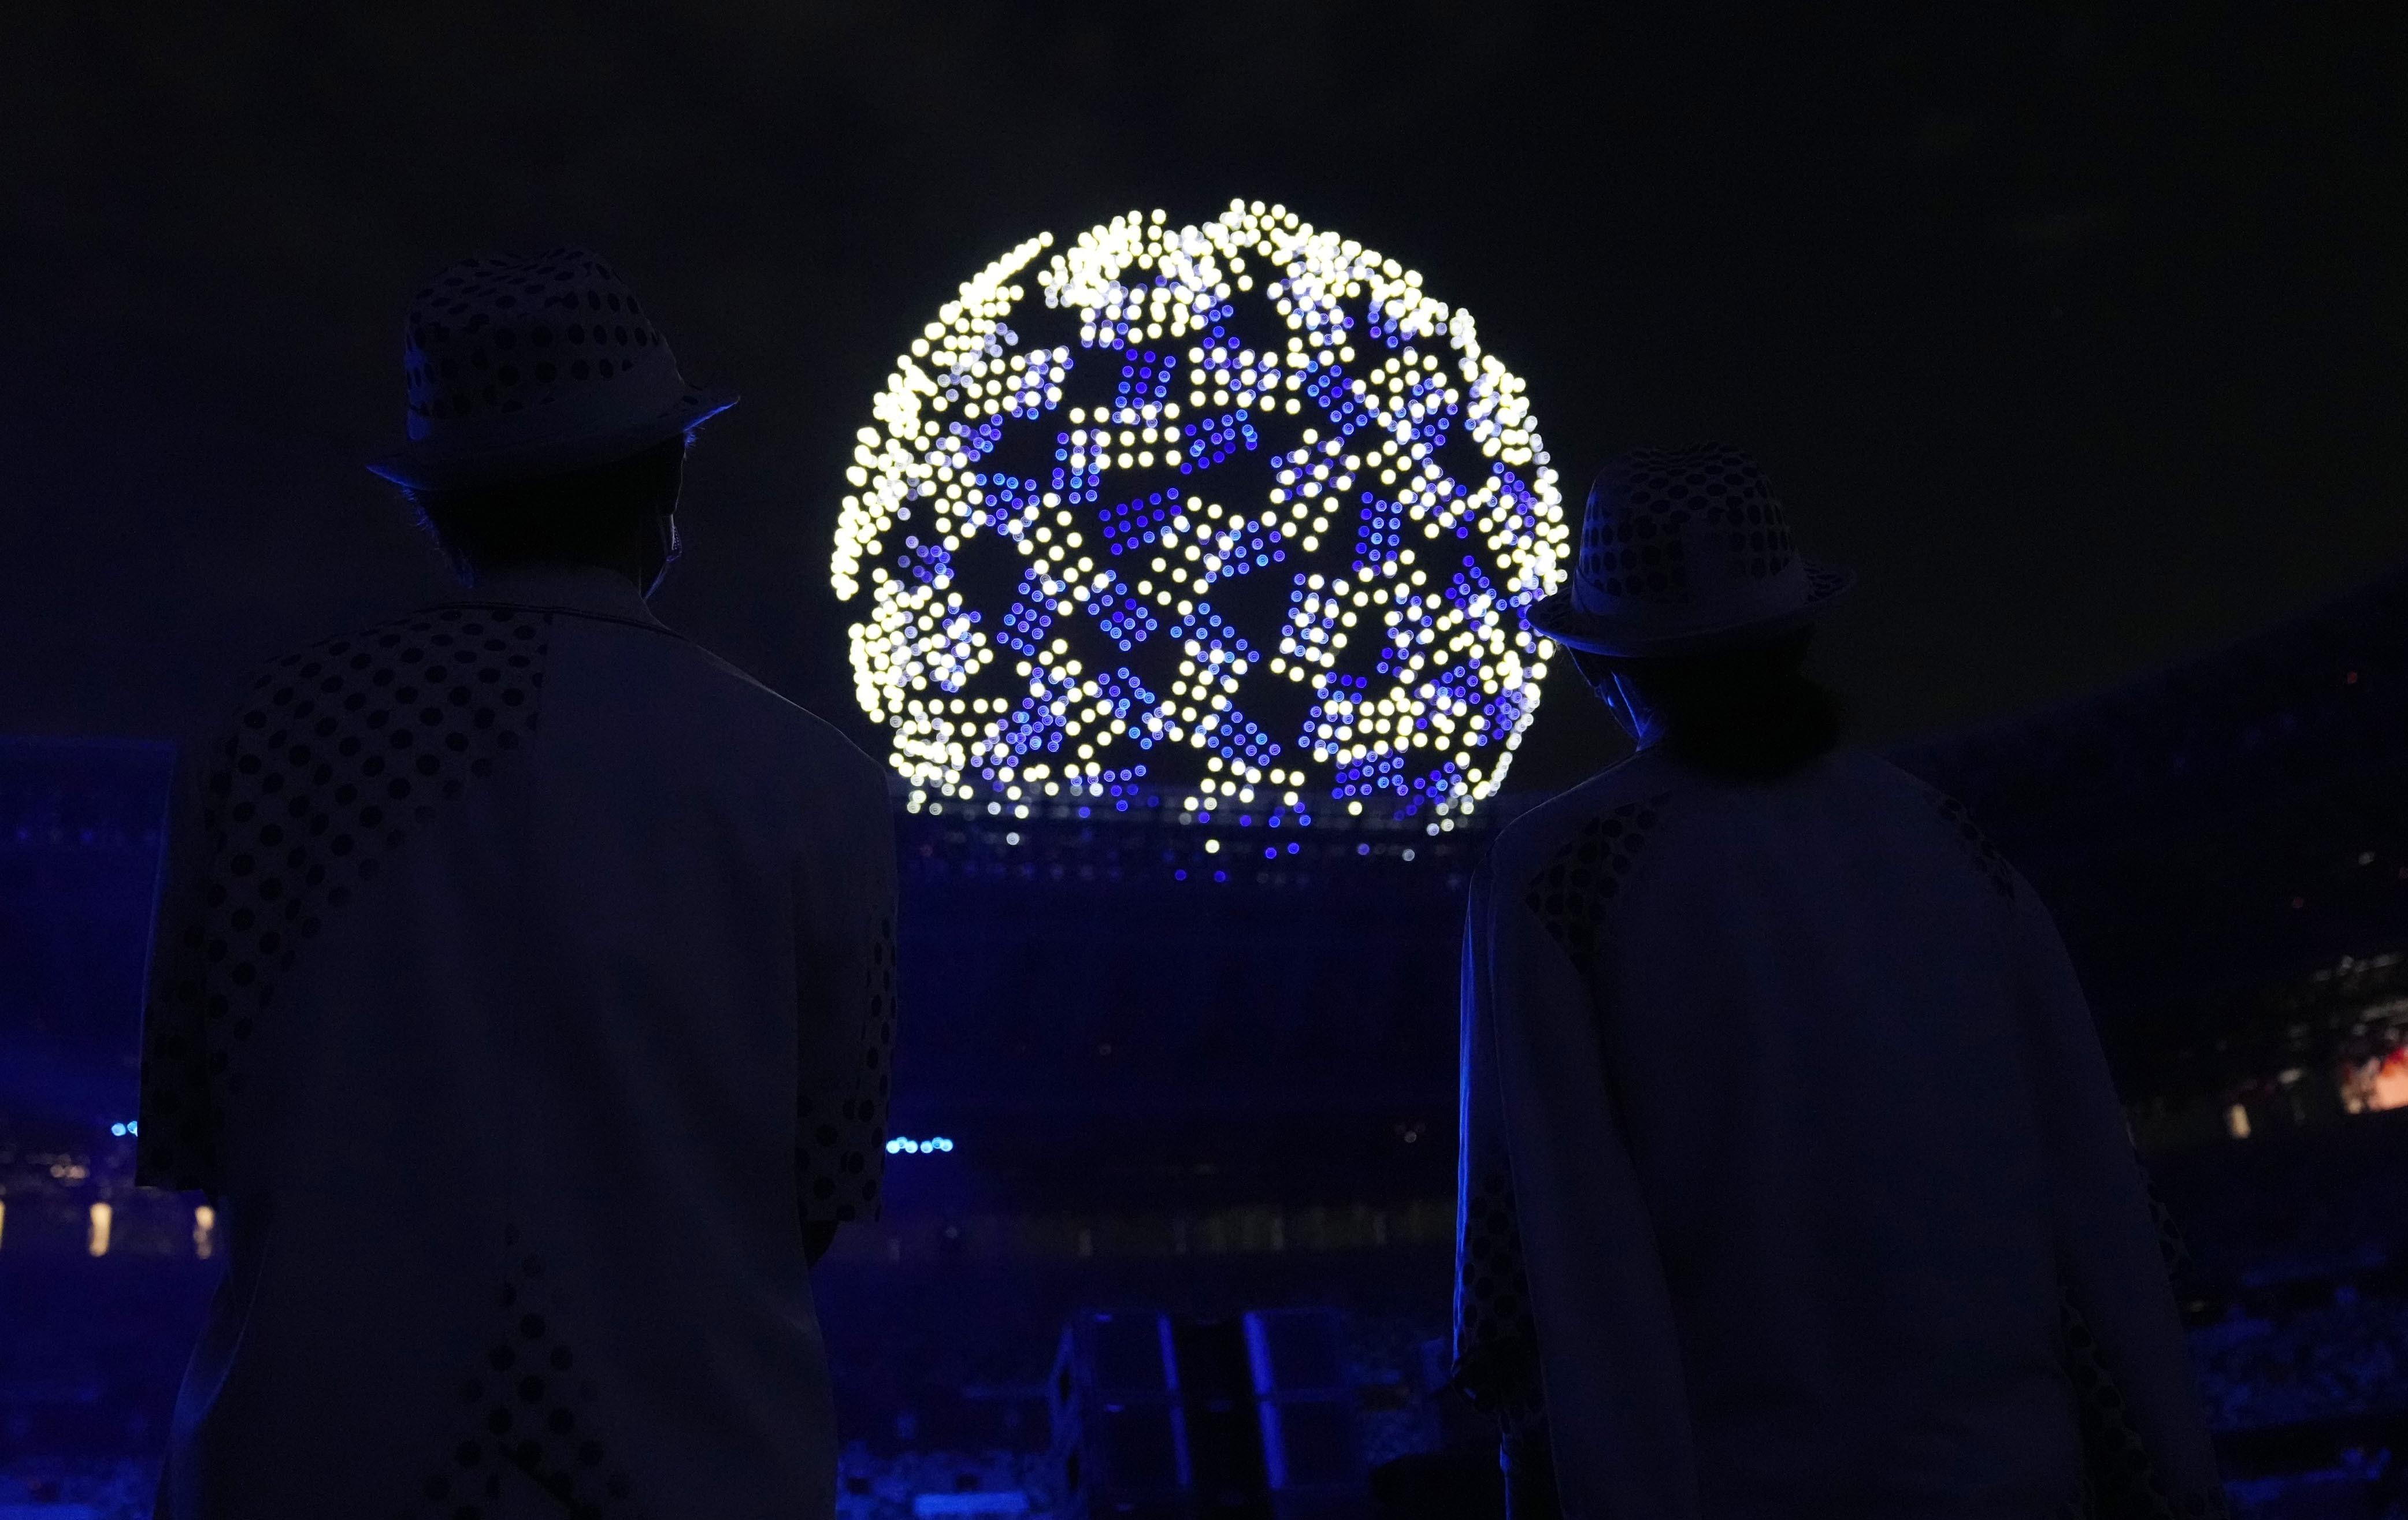 drone-fireworks-image